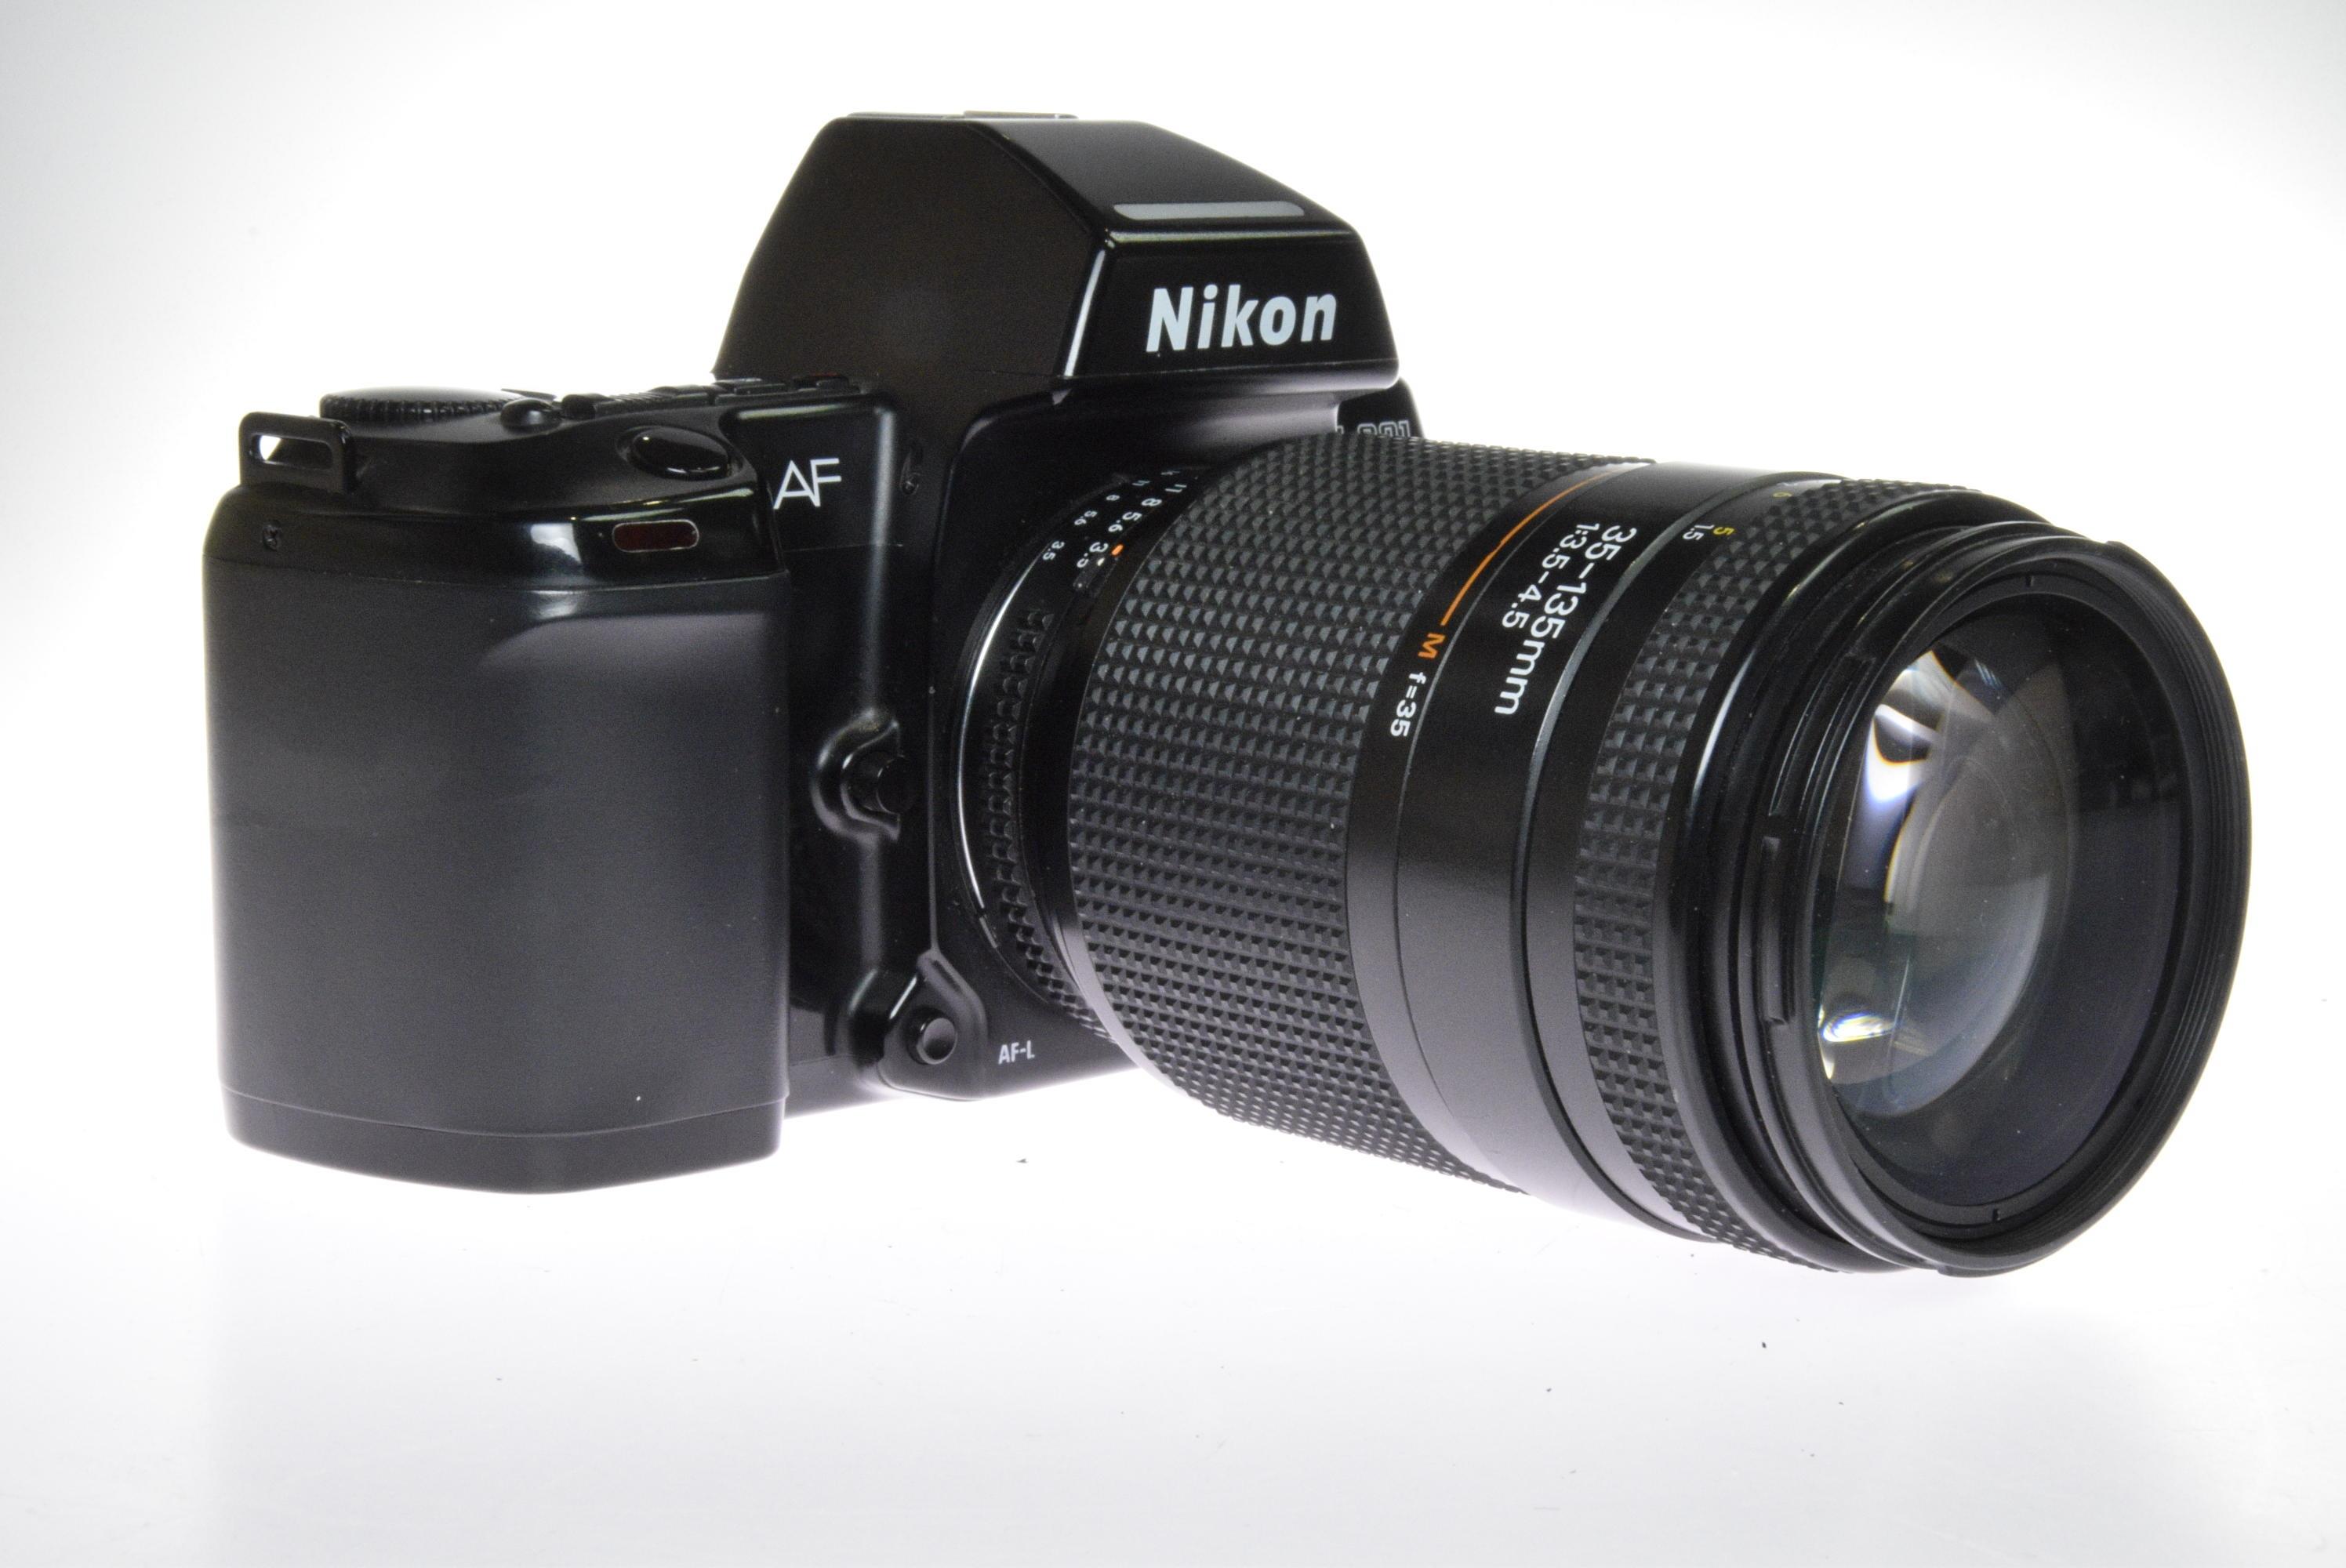 Used Nikon F801 35mm SLR Camera & 35-135mm Zoom Lens (Commission Sale)